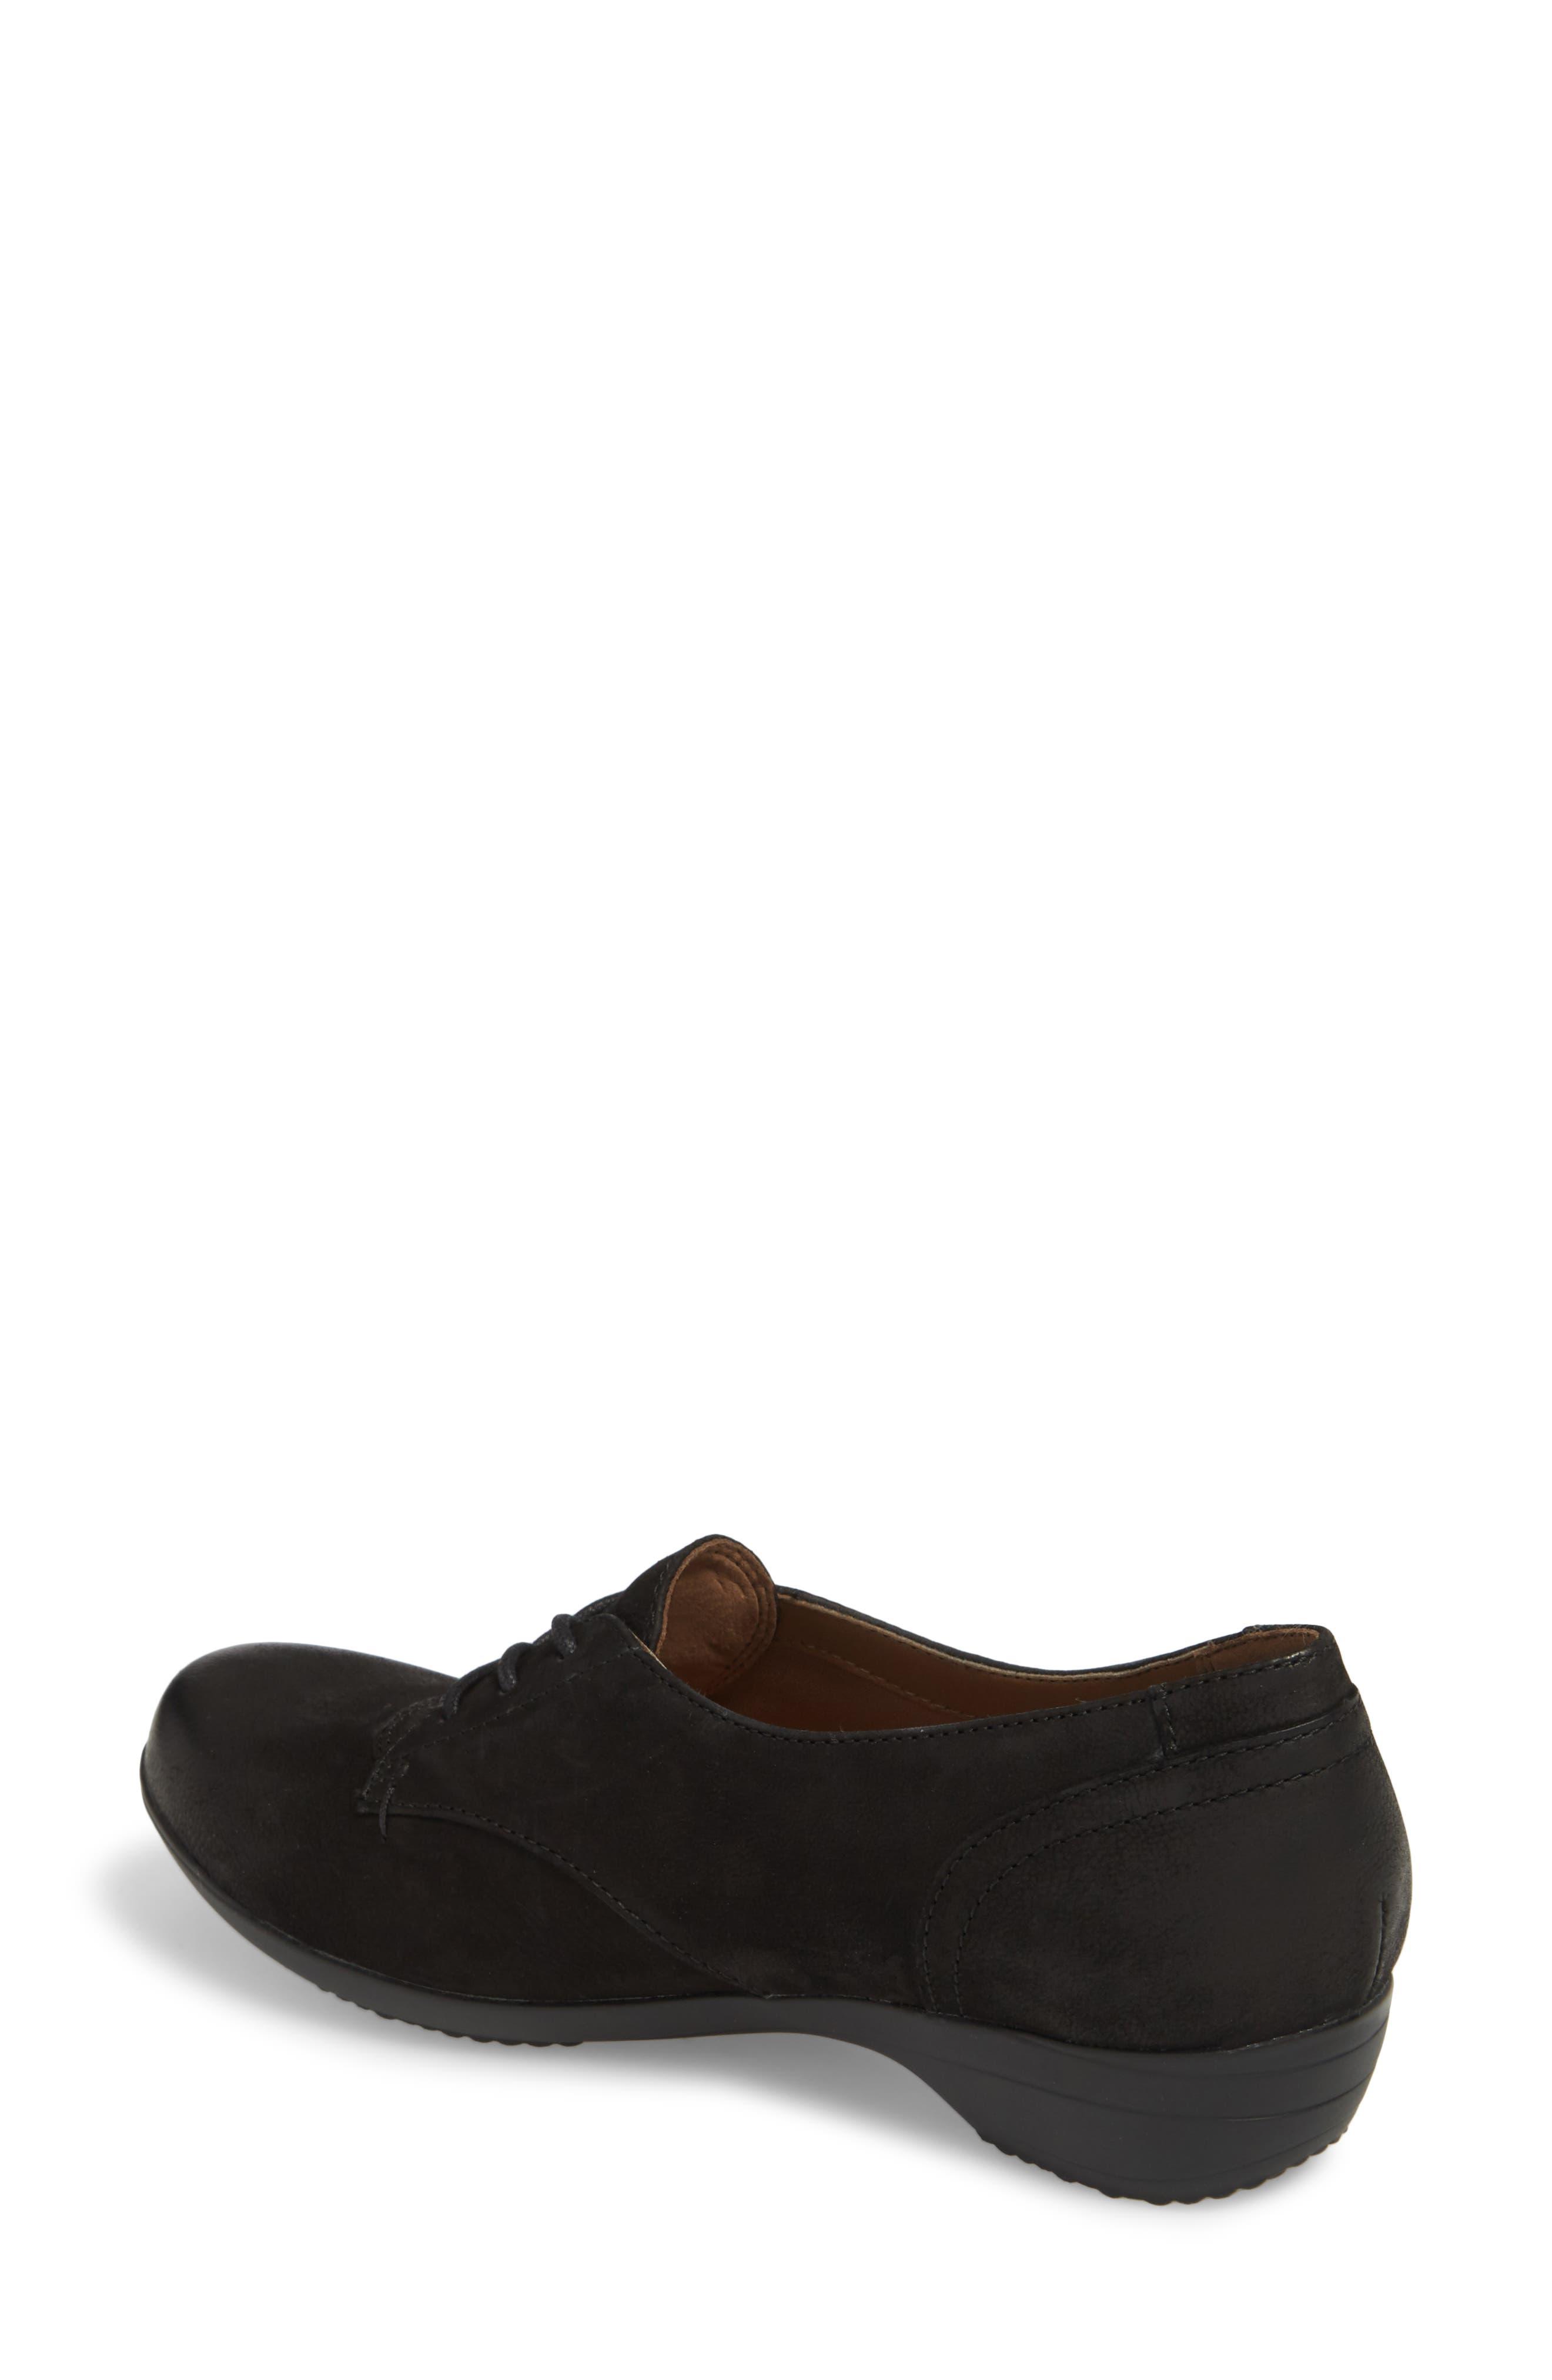 Fallon Derby,                             Alternate thumbnail 2, color,                             Black Burnished Nubuck Leather